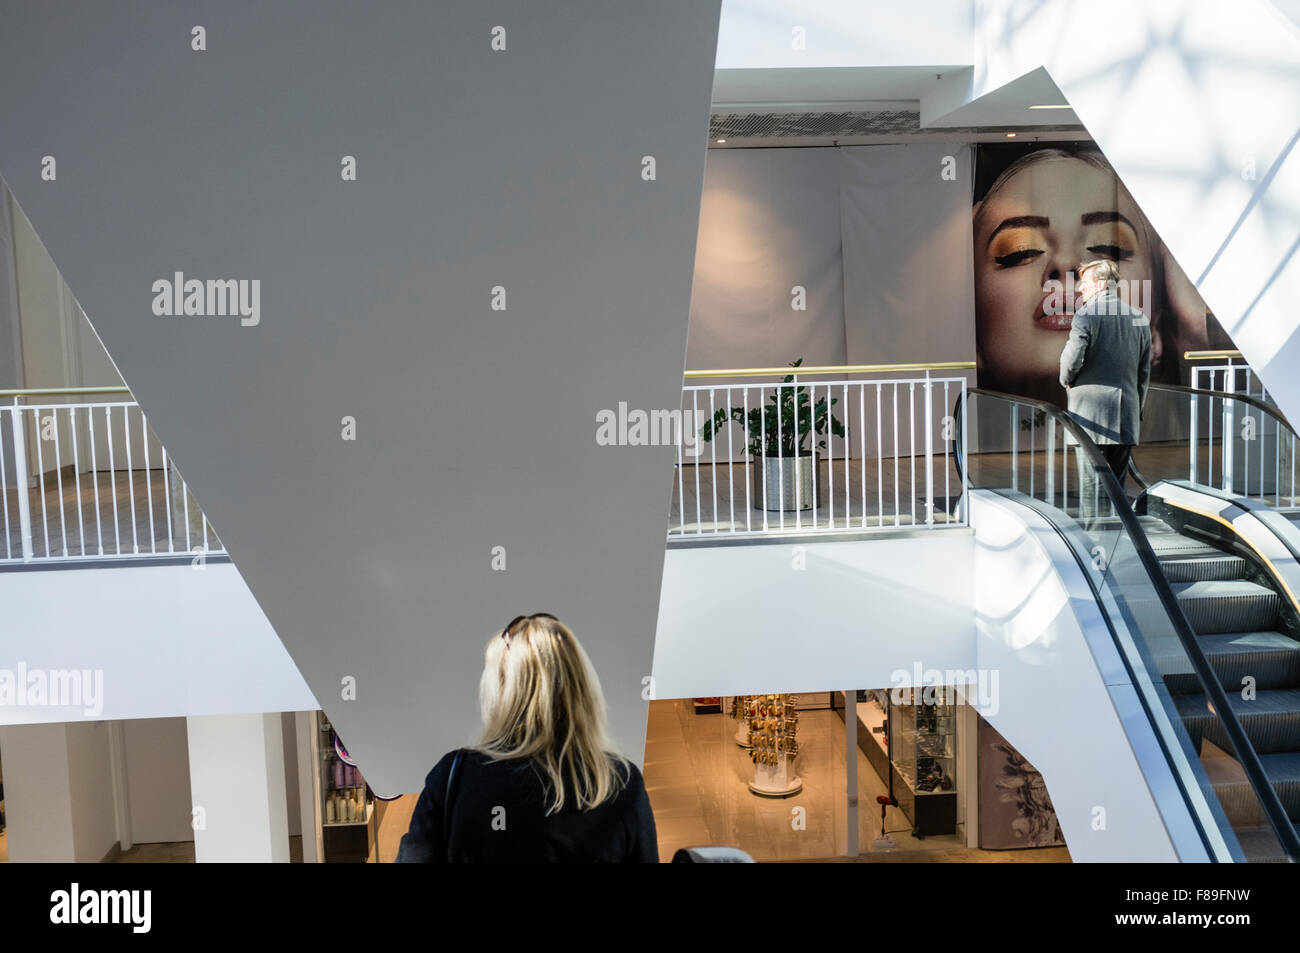 GO9 shopping mall at Gedimino st. 9 Vilnius, Lithuania, Europe - Stock Image